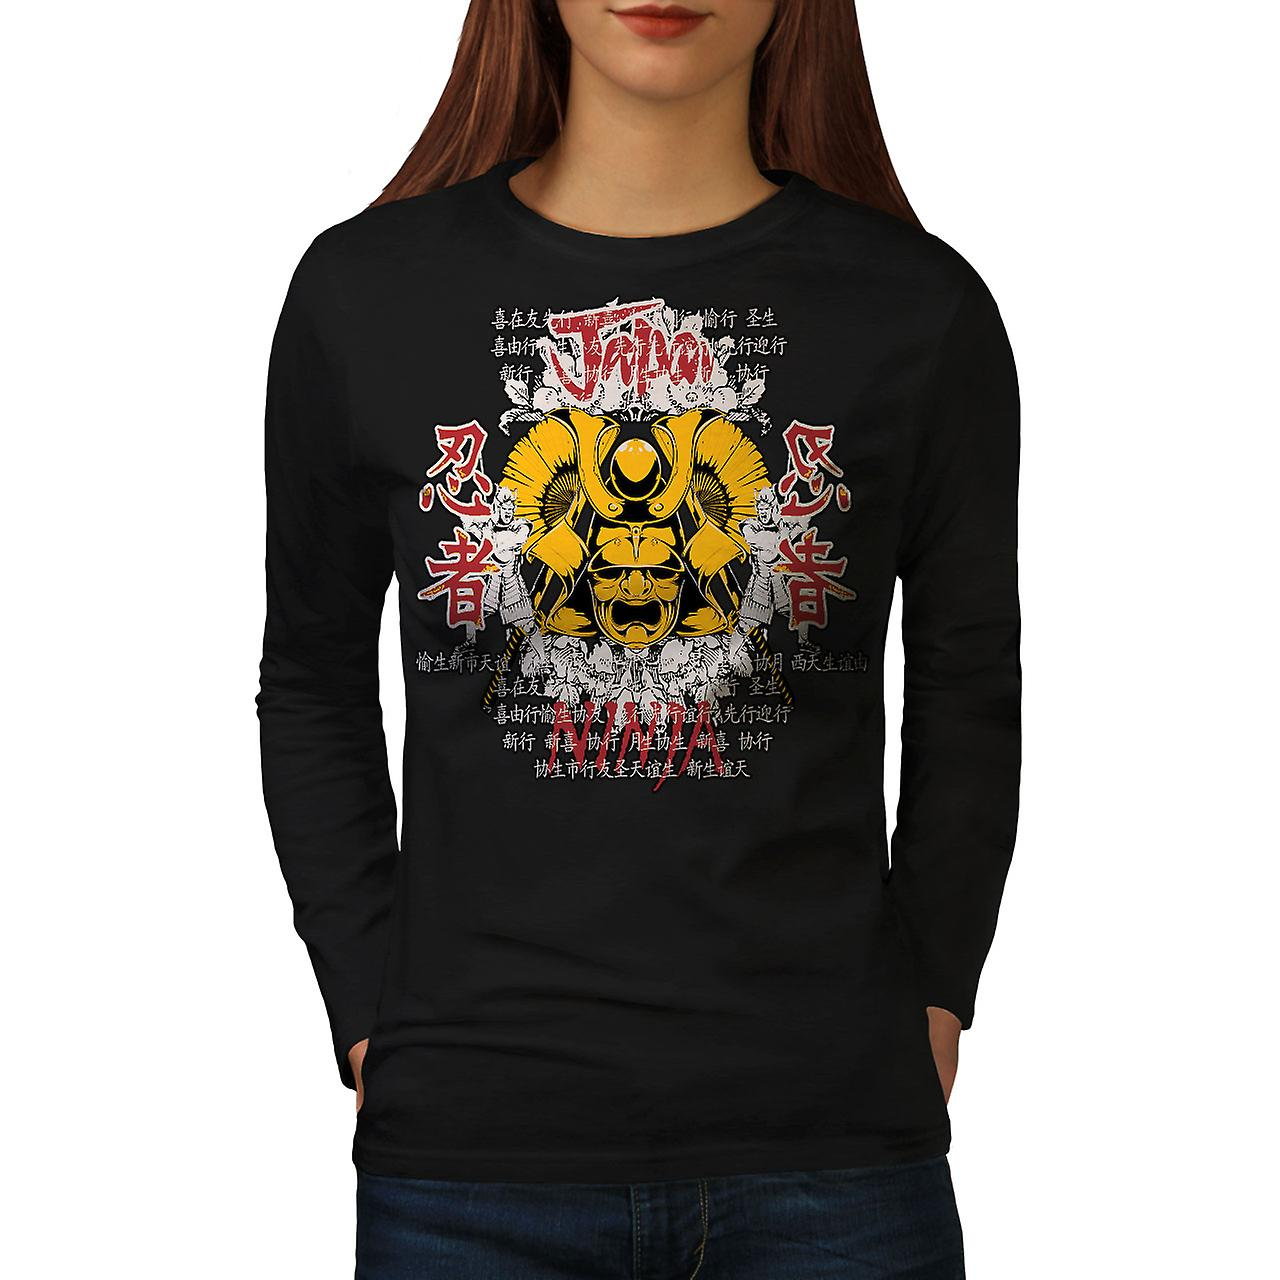 Mujeres camiseta de manga BlackLong de fantasía oriental Ninja | Wellcoda